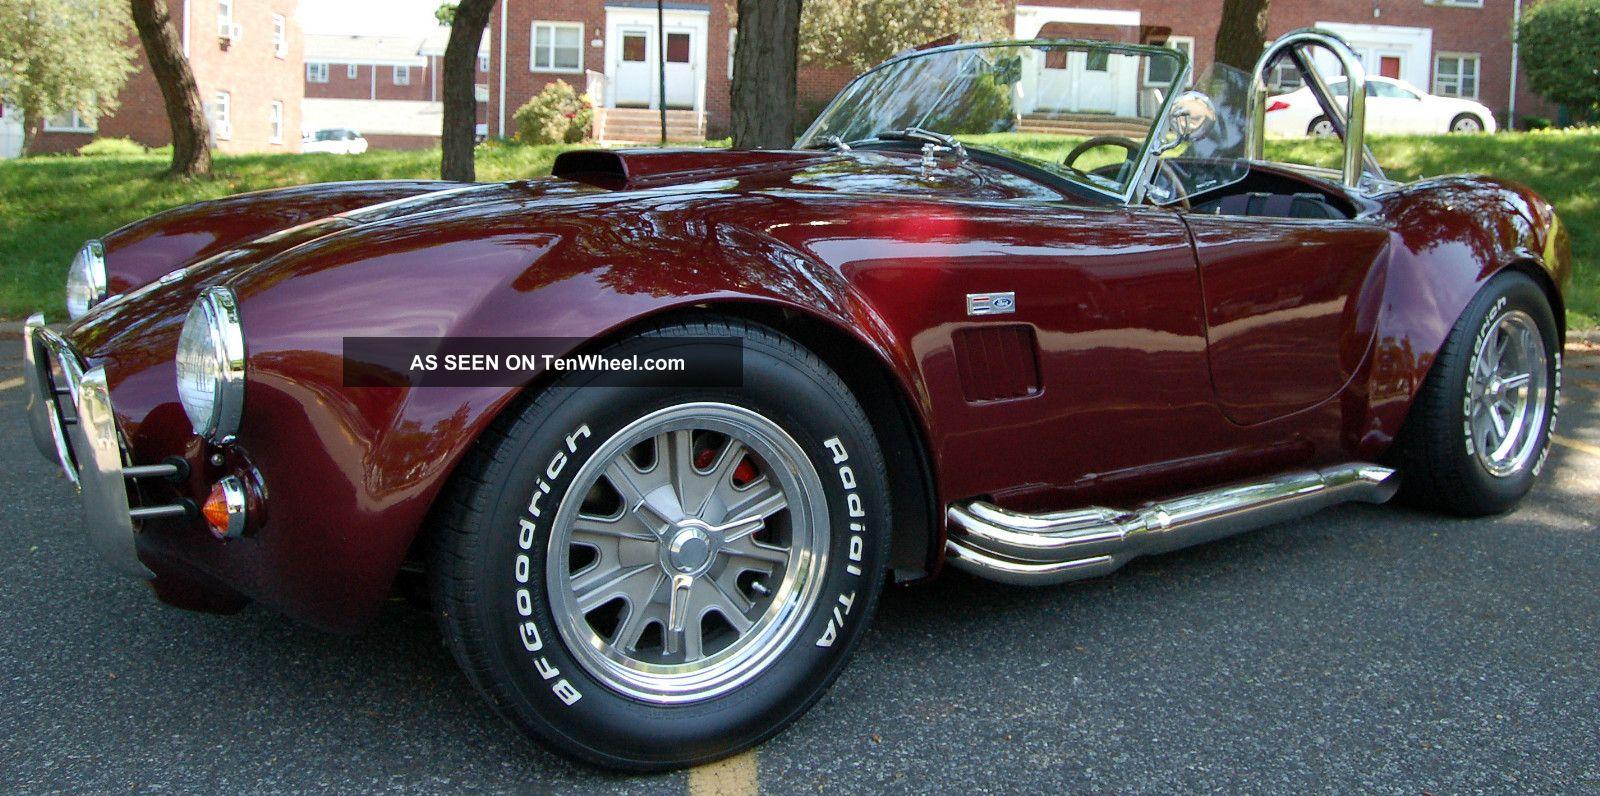 Factory Five Racing 1965 Cobra Replica Replica/Kit Makes photo